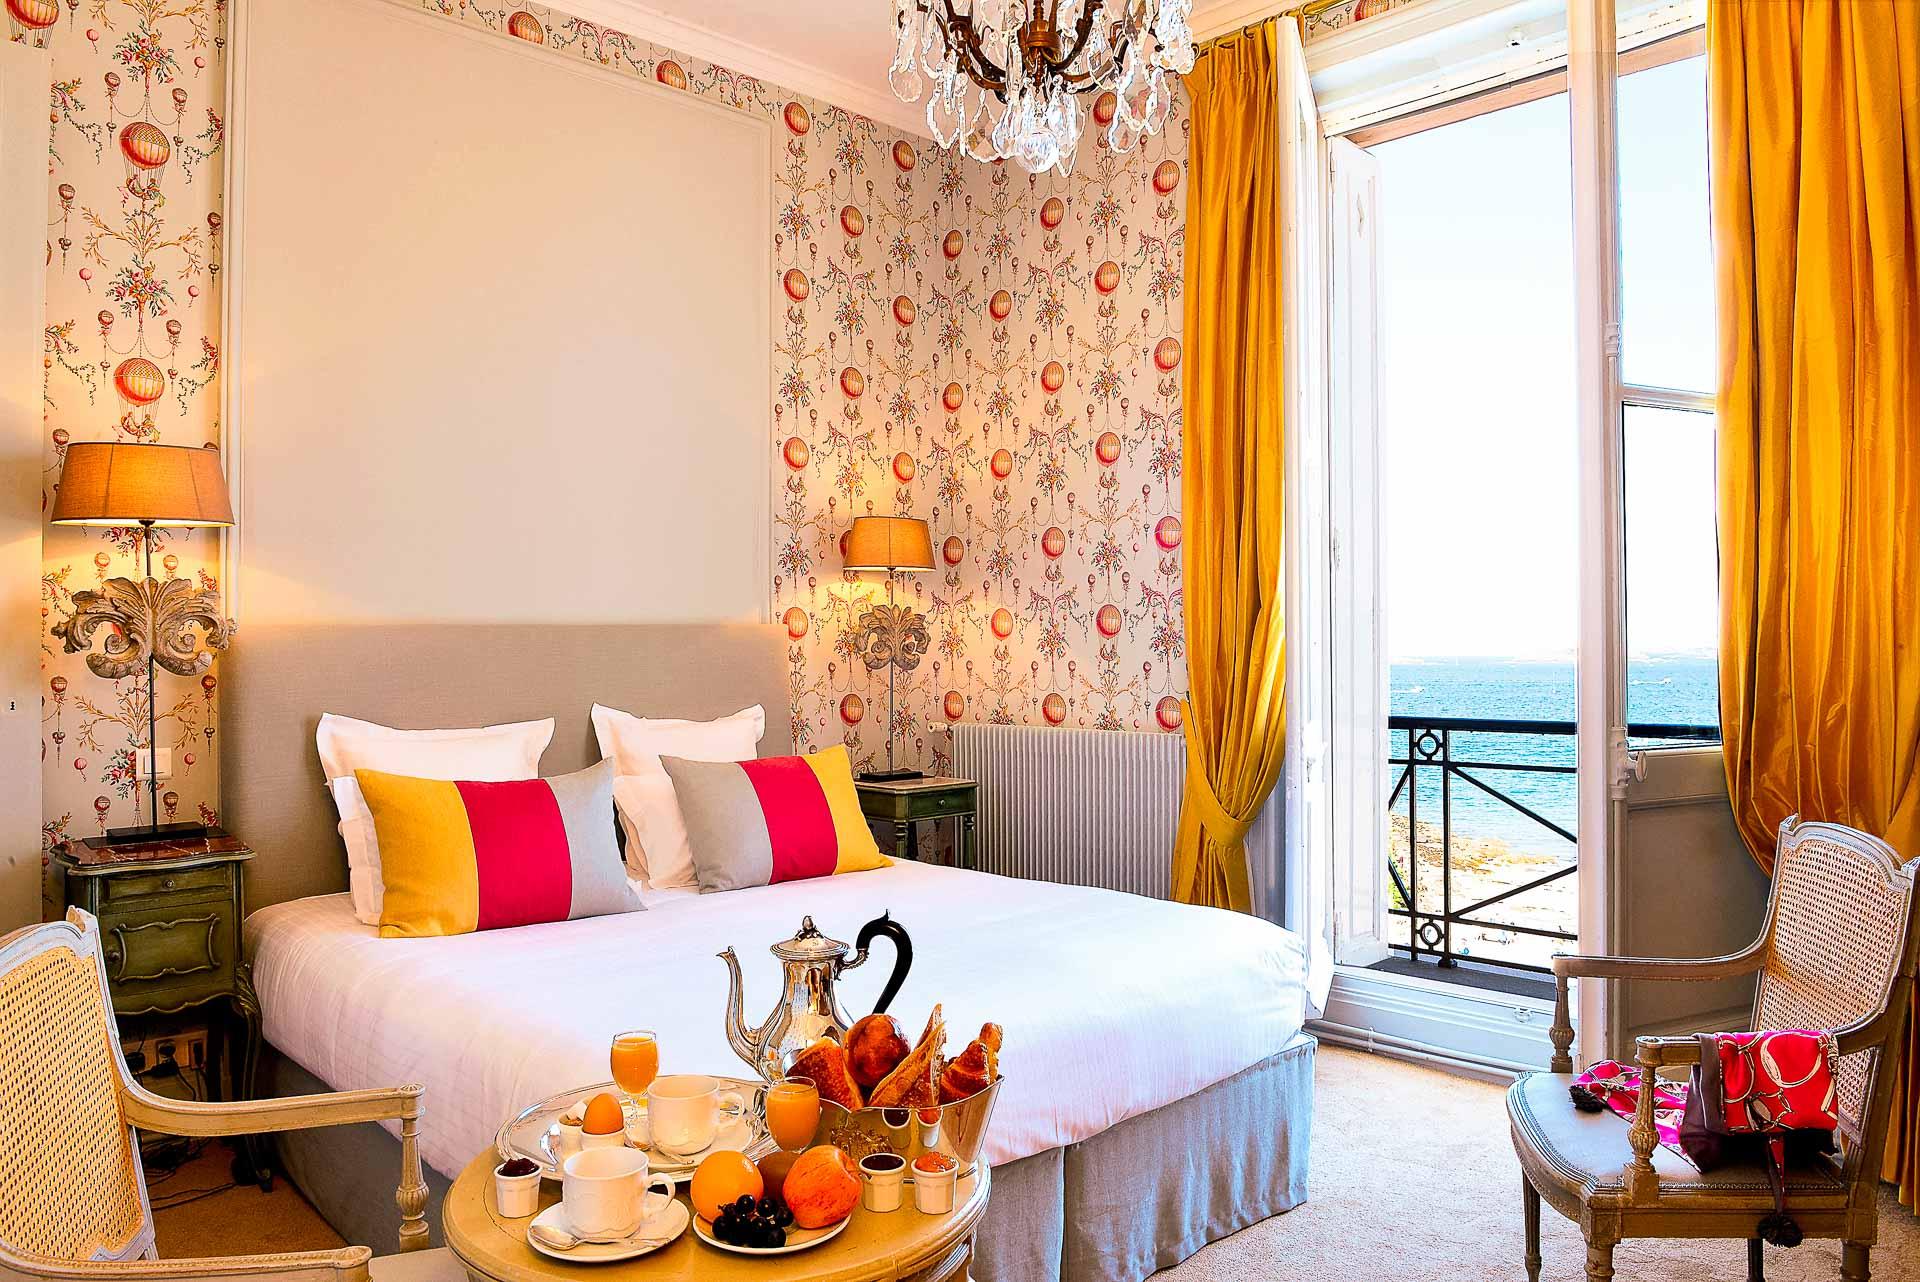 Hotel luxe bretagne bord de mer  Hôtel au centre ville de Dinard